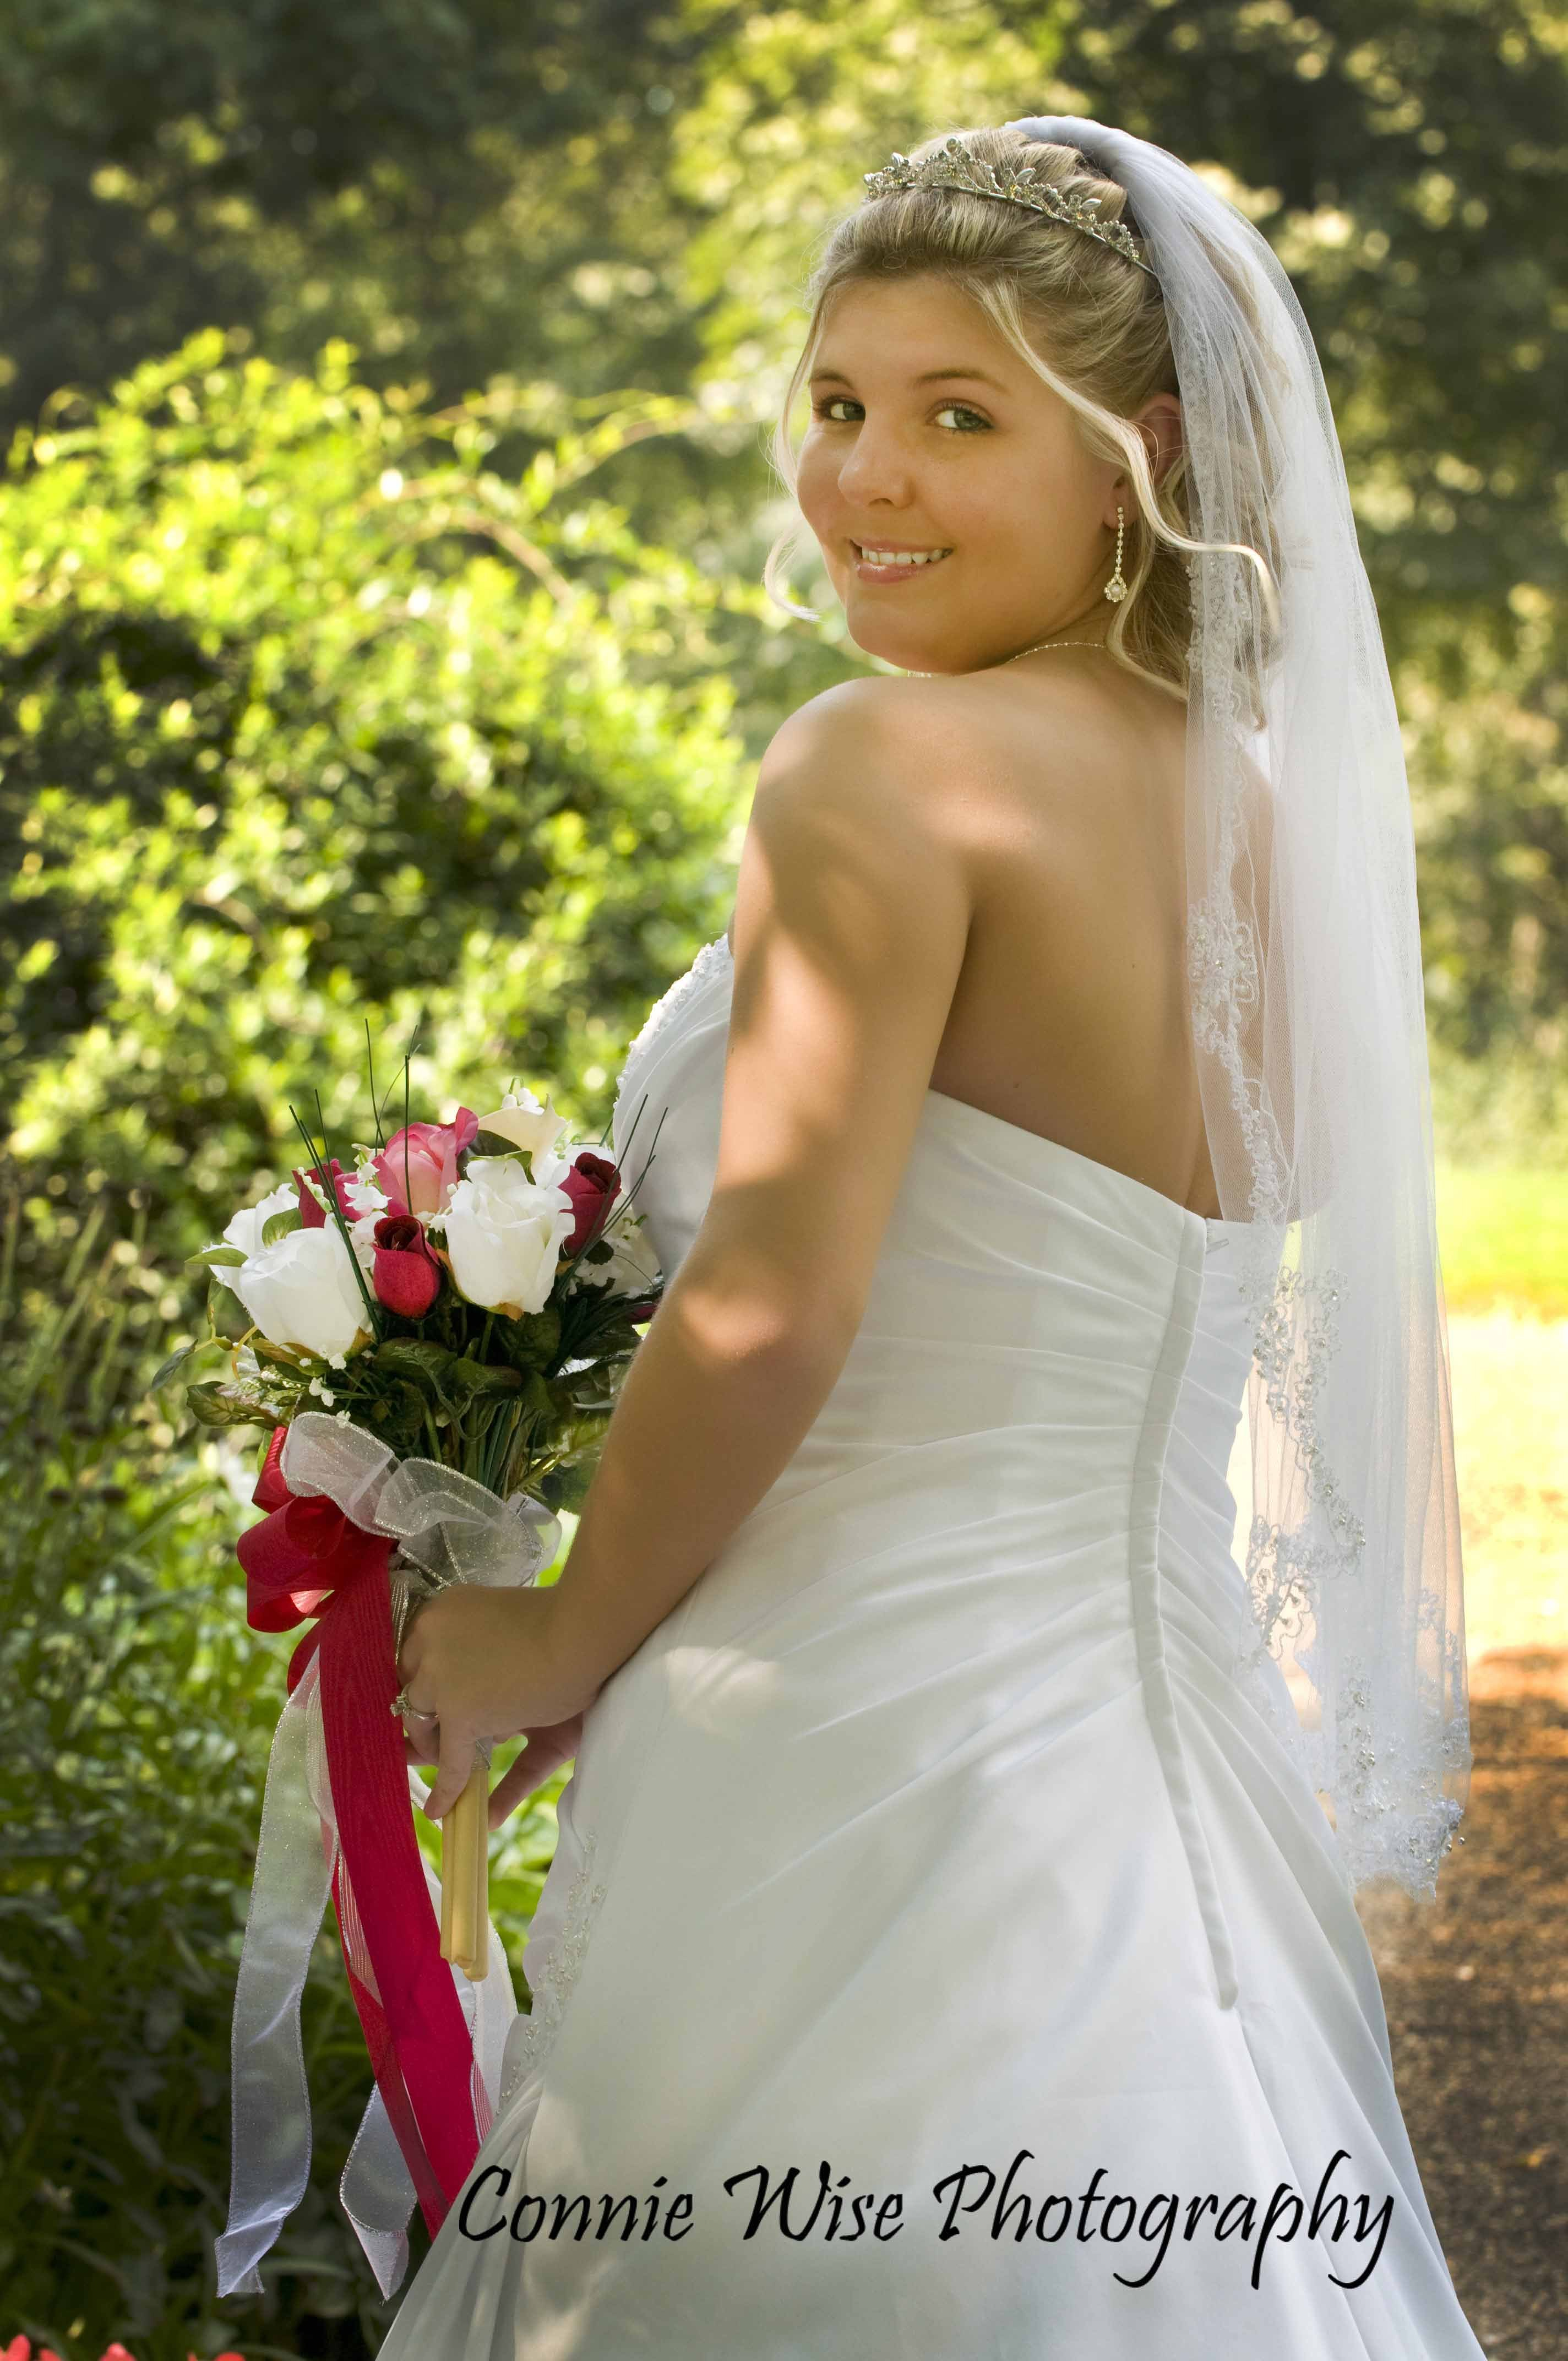 Beauty, Ceremony, Flowers & Decor, Wedding Dresses, Fashion, white, pink, dress, Ceremony Flowers, Bride Bouquets, Flowers, Bouquet, Portrait, Hair, Bridal, Photojournalistic, Connie wise photography, Tradtitional, Flower Wedding Dresses